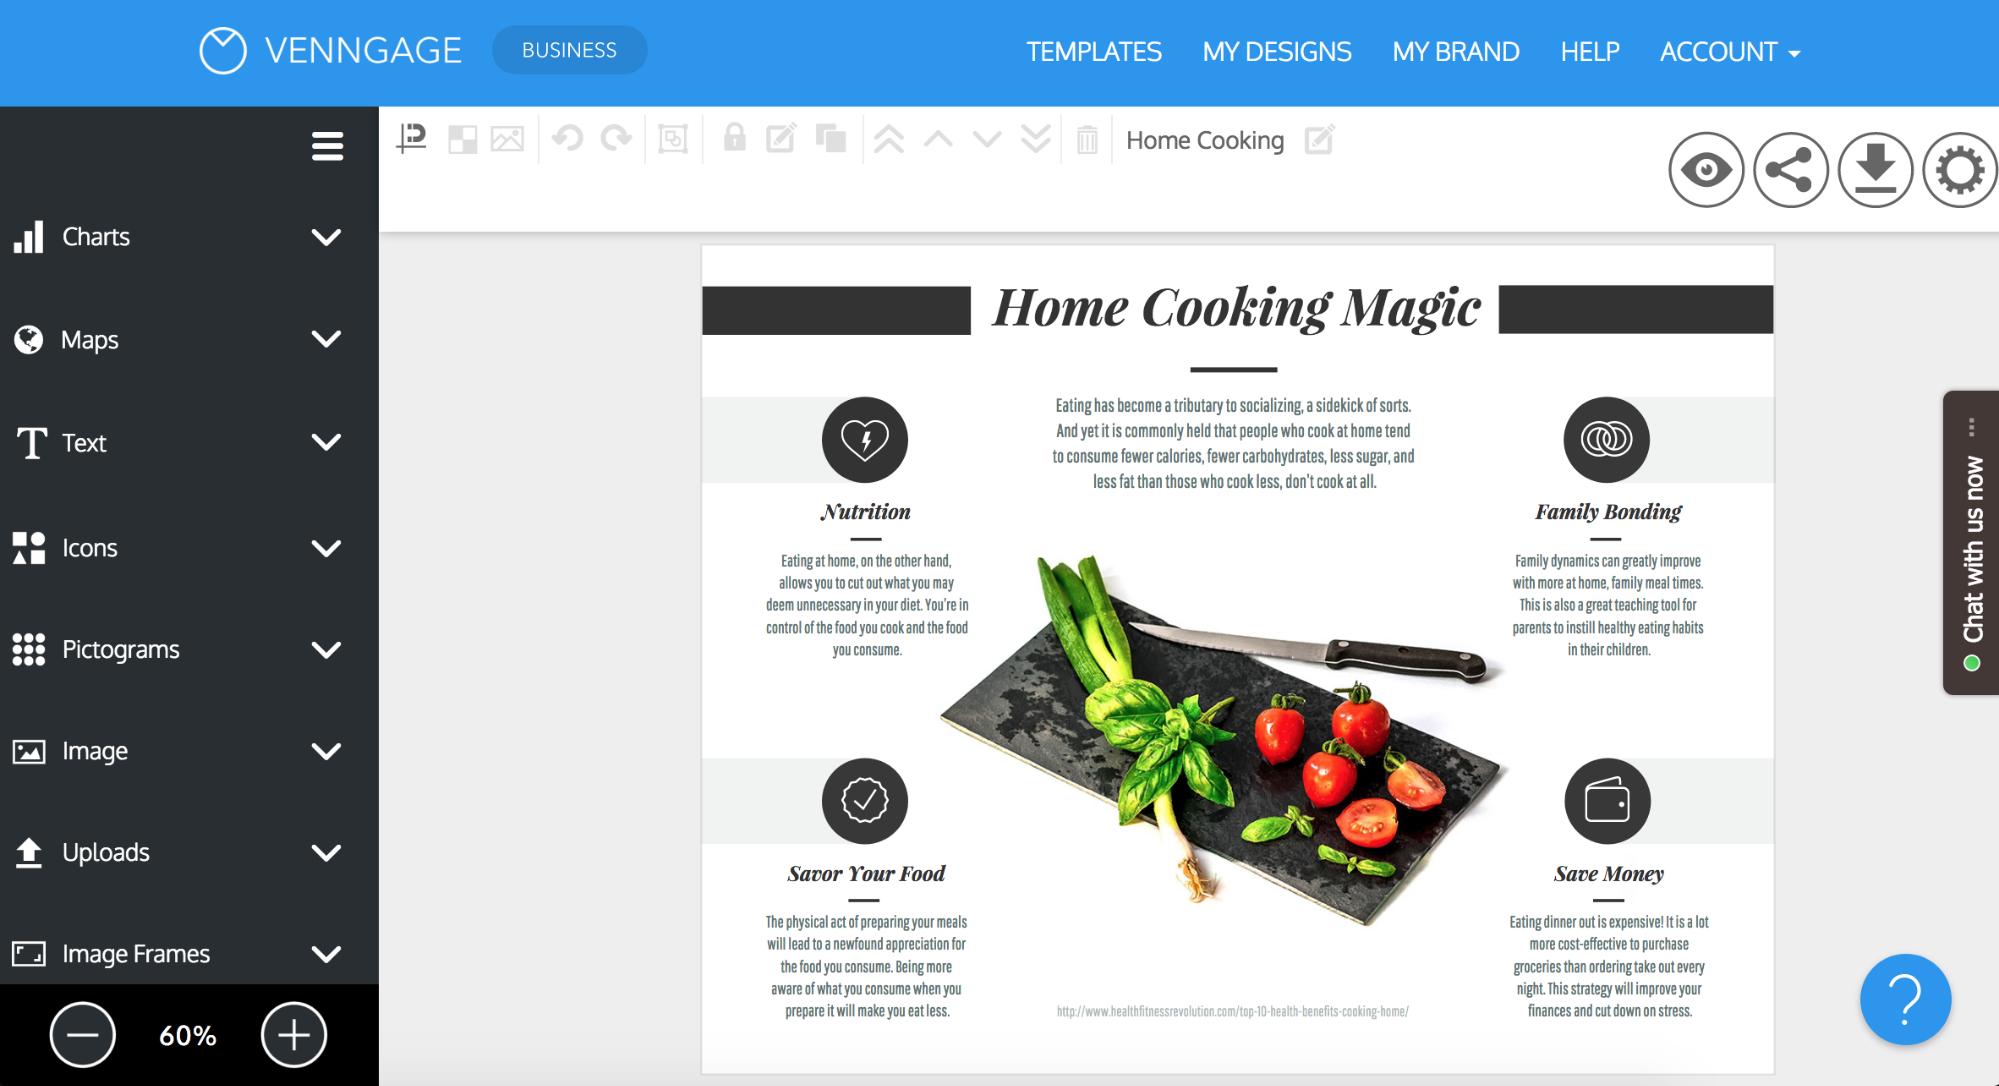 Online Brochure Maker - Make Your Own Brochure With Venngage - Online Brochure Maker Free Printable